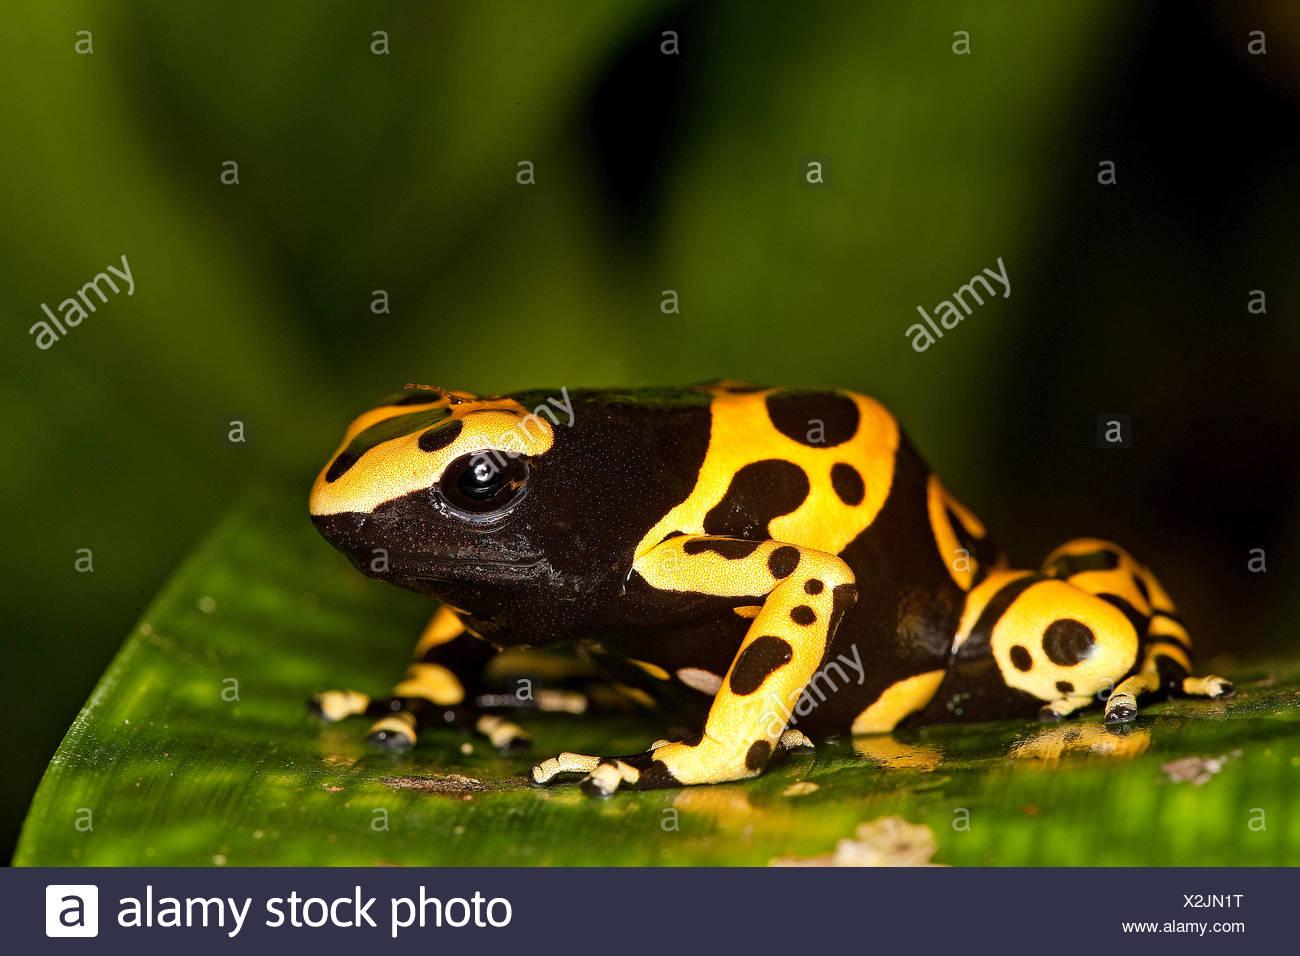 Con banda amarilla Rana, Dendrobates leucomelas Poisson, Venemous Specy desde Sudamérica, adulto Imagen De Stock